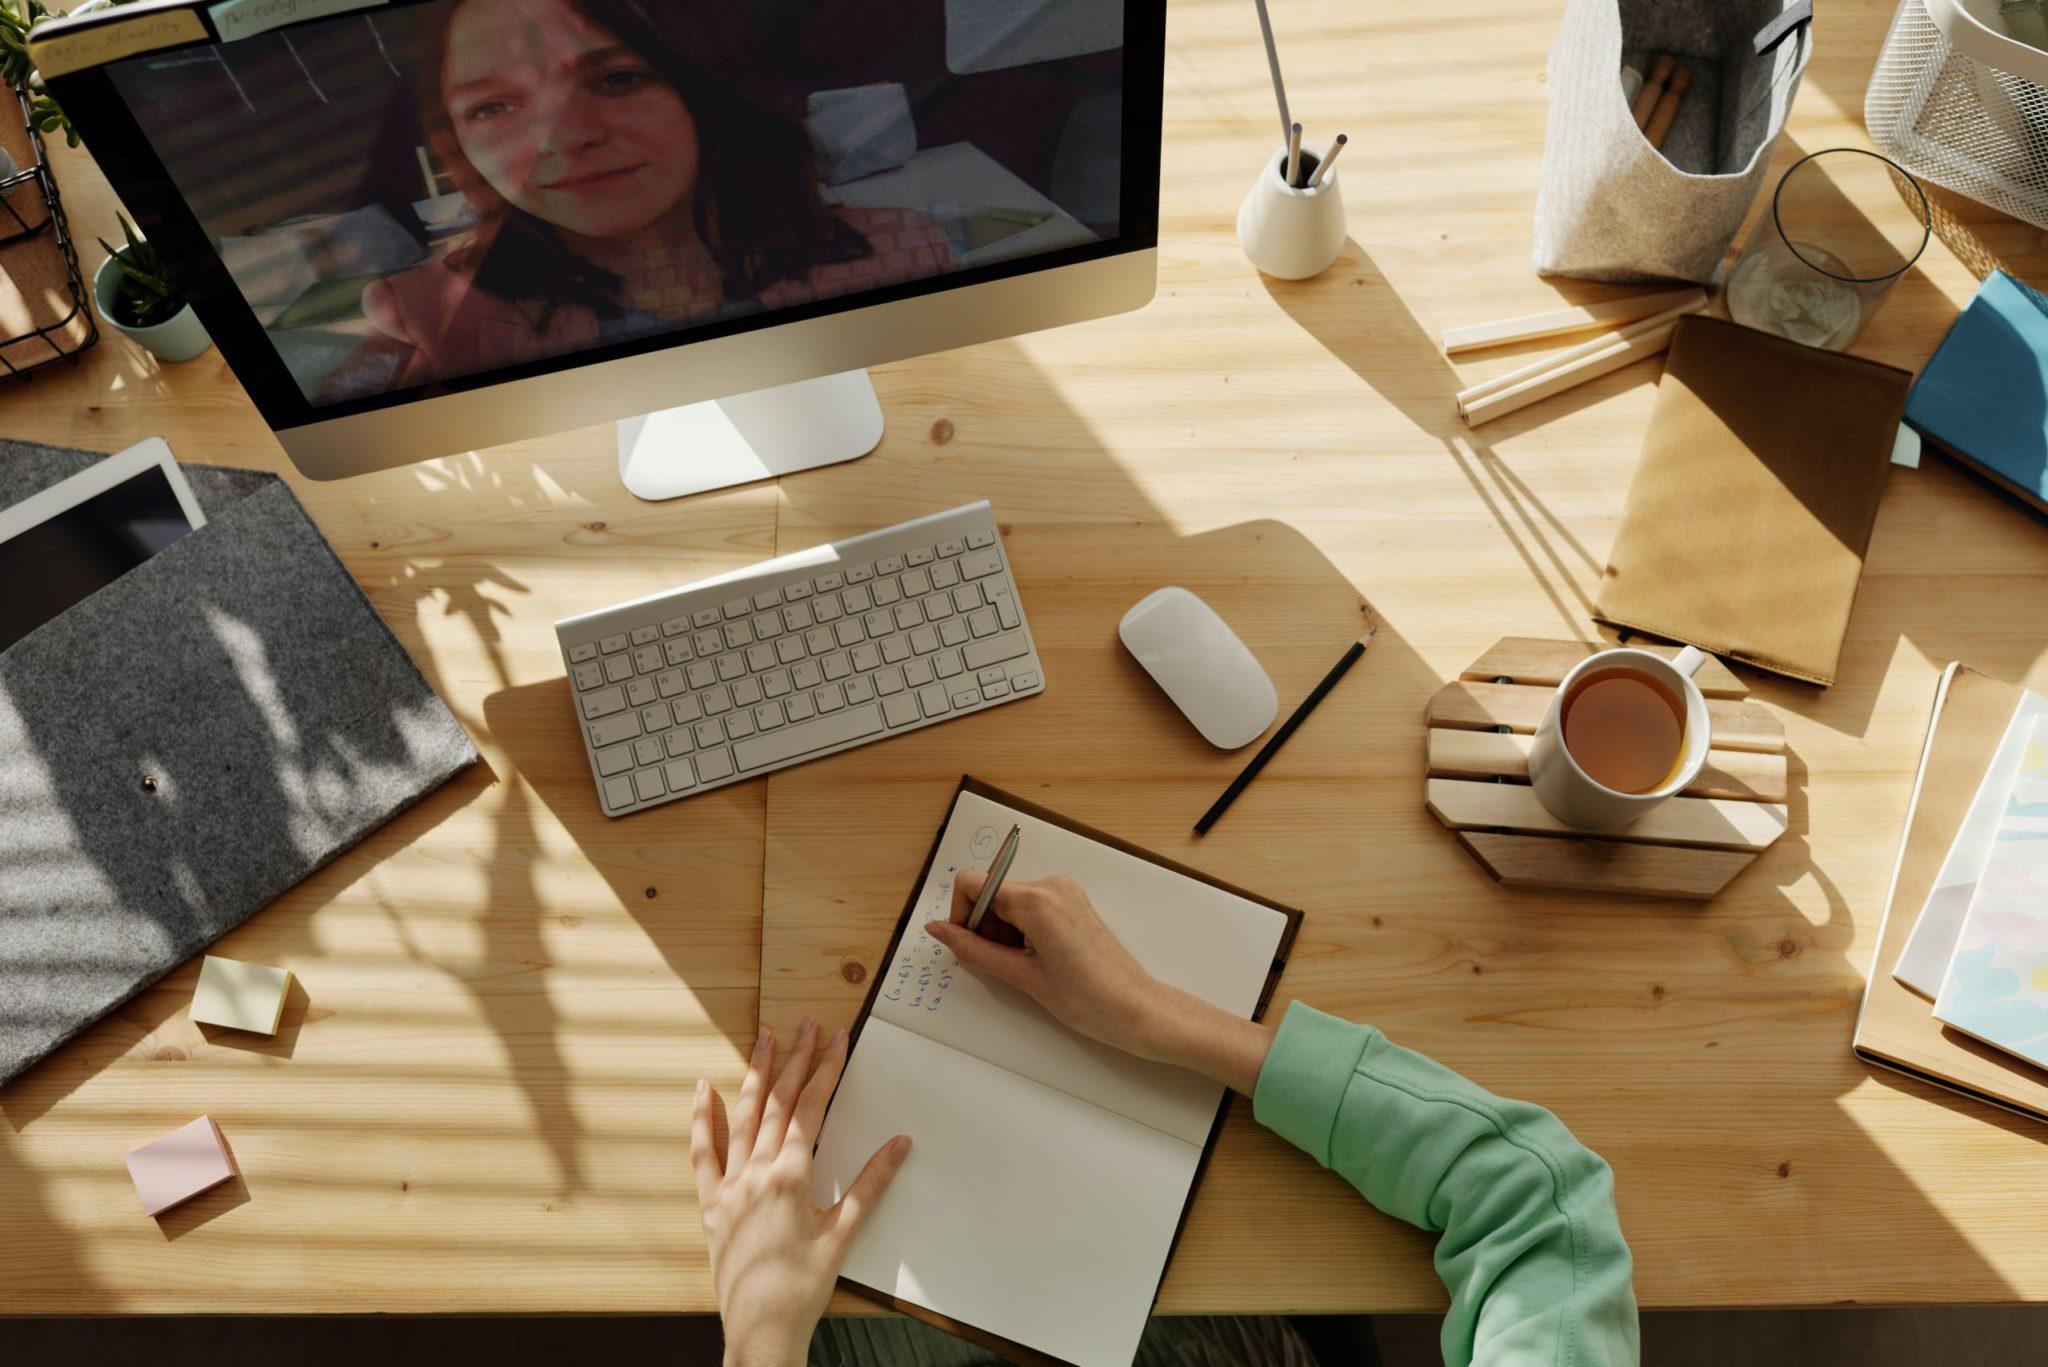 11 Long-distance Fun Virtual Date Ideas